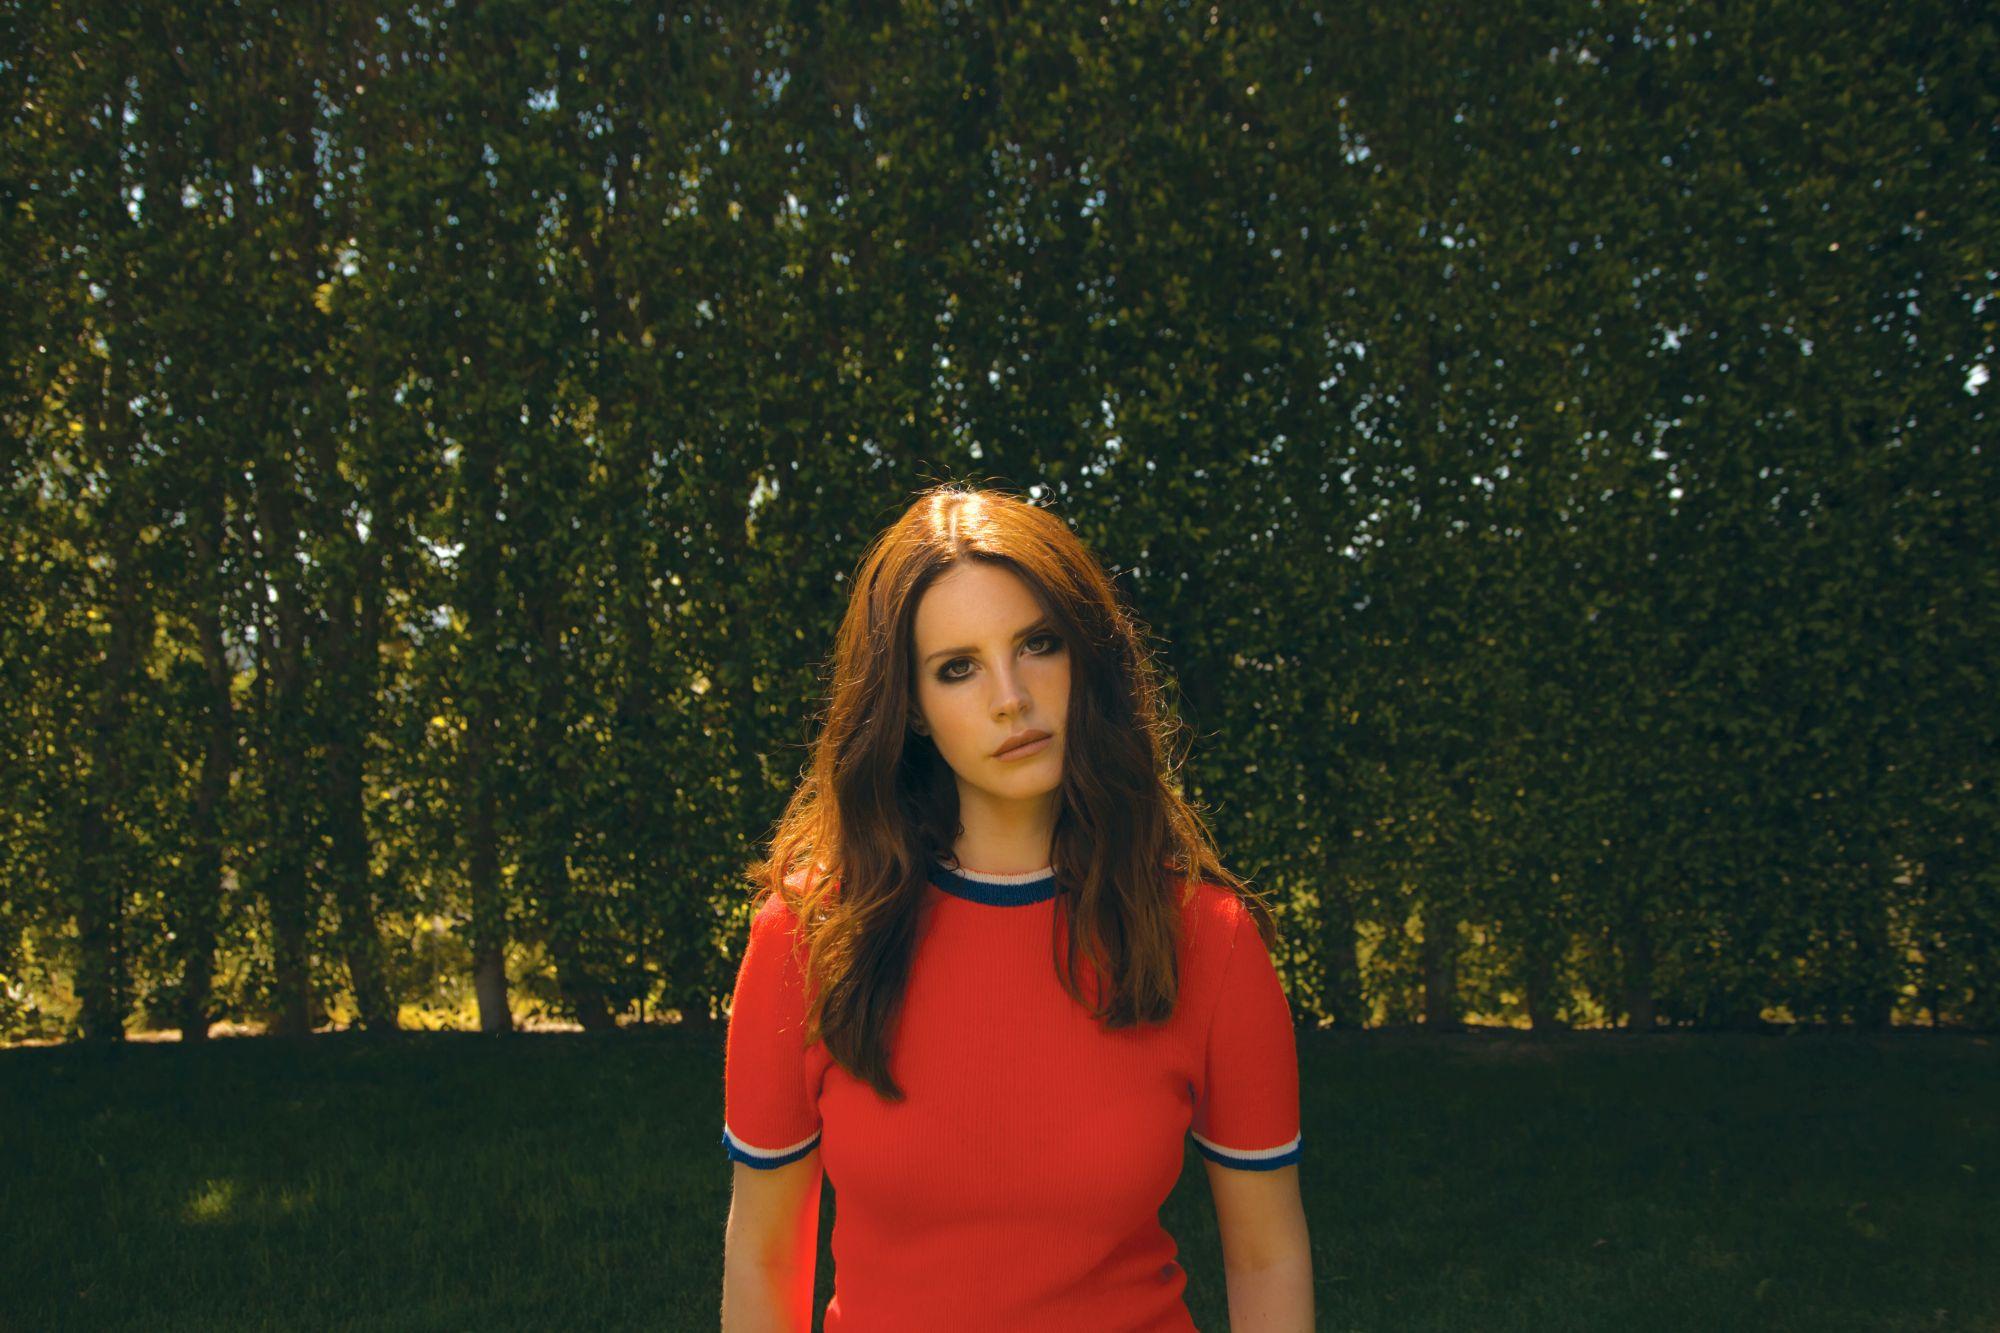 Pictures Of Lana Del Rey 2000x1333